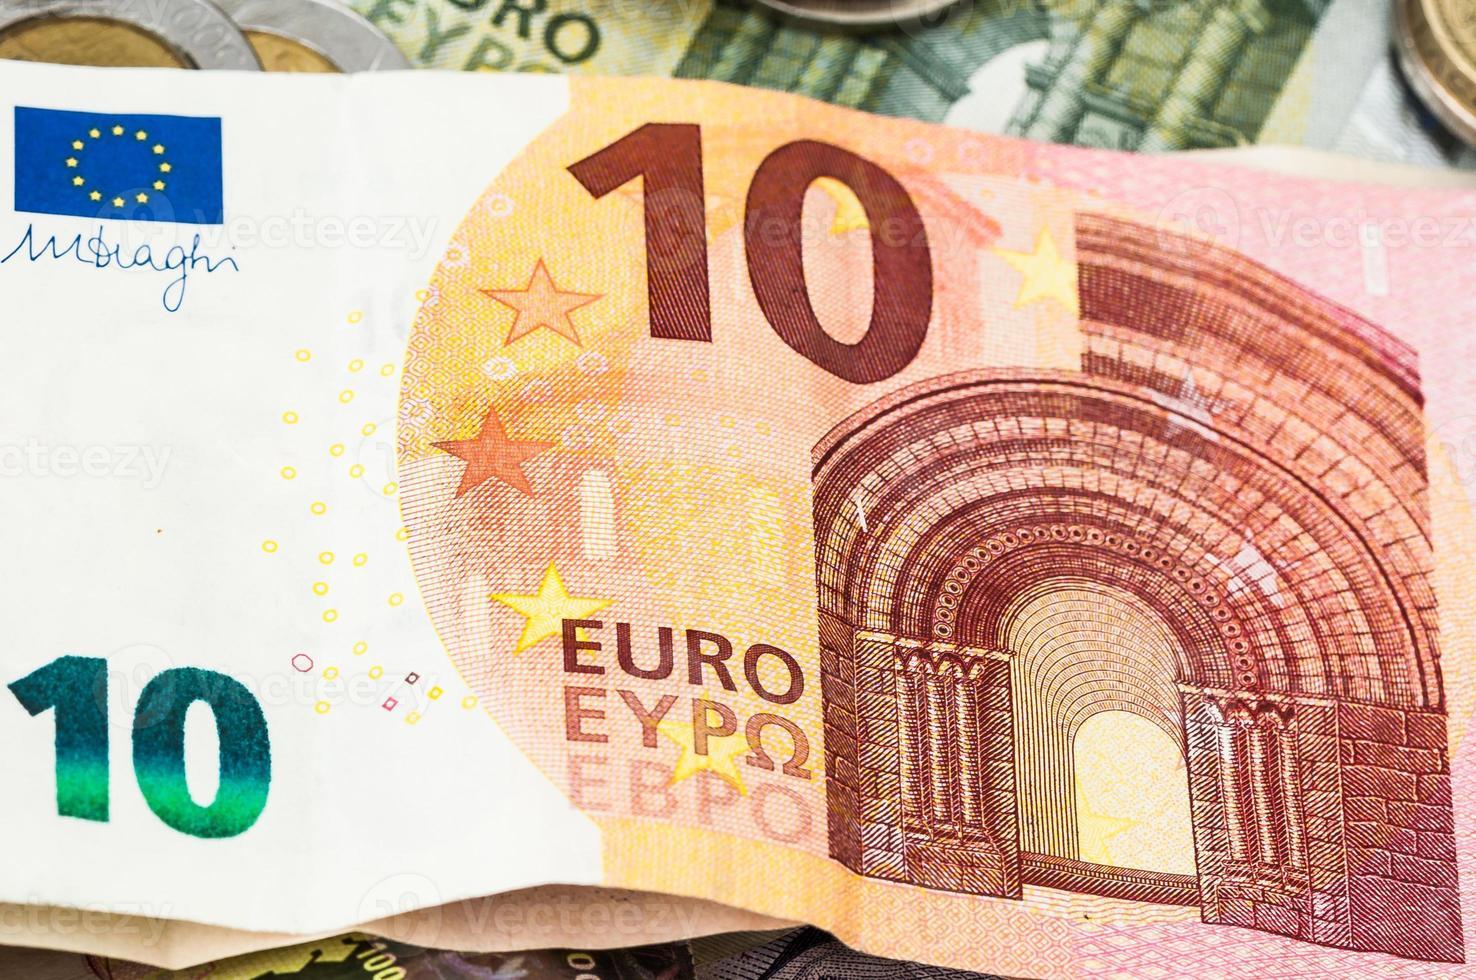 argent dix euro dollar bill pièces photo